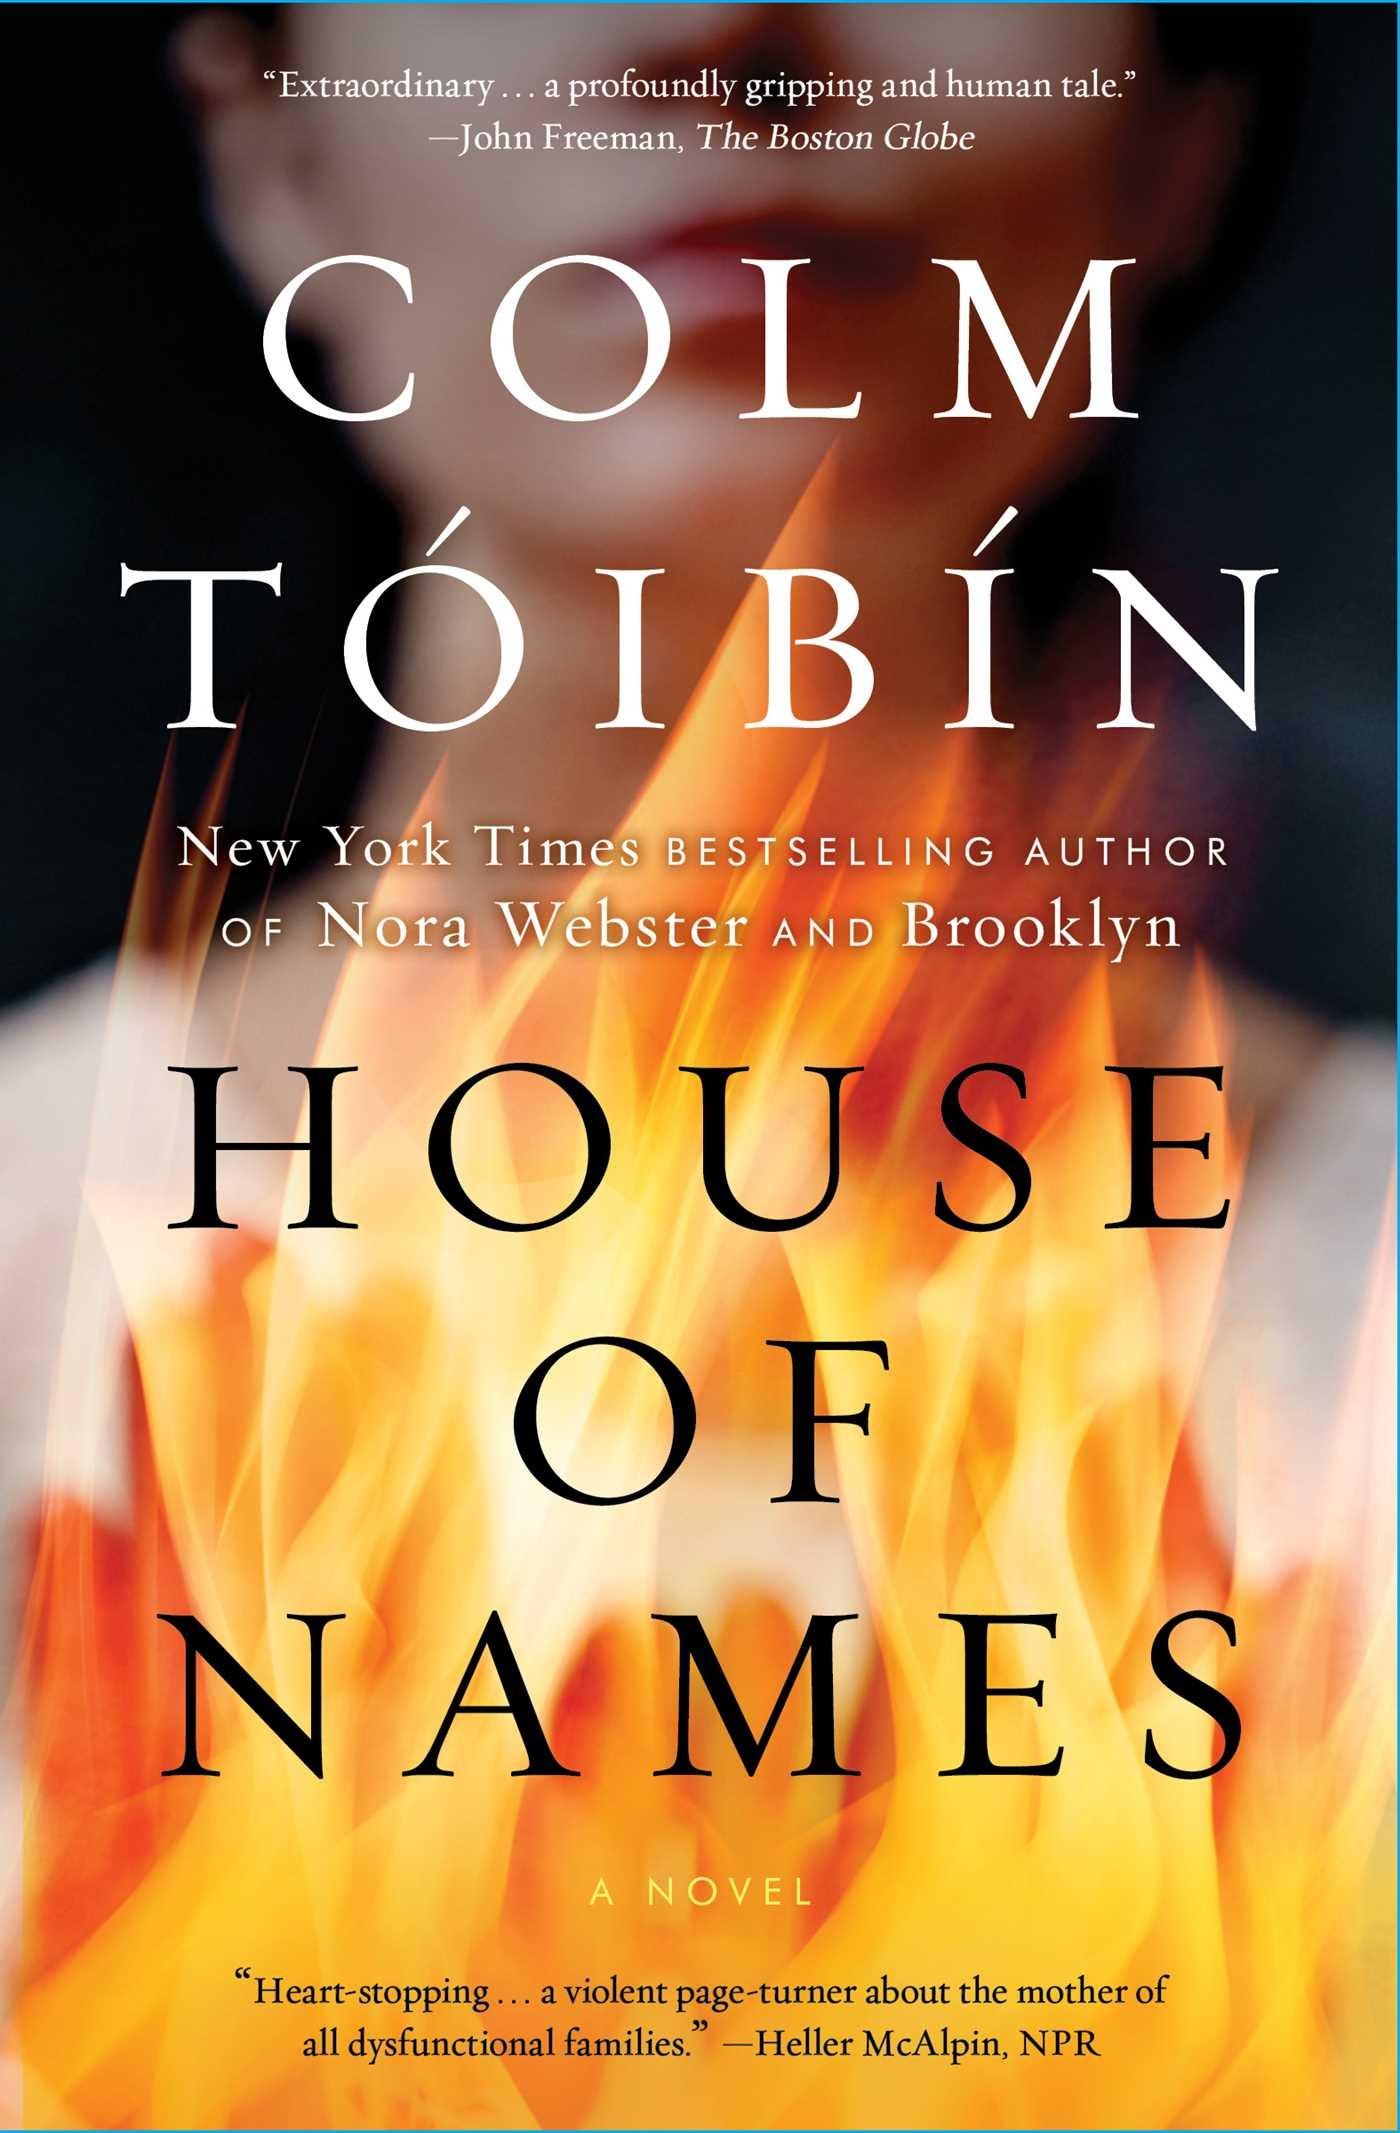 HOUSE OF NAMES: Amazon.es: Toibin, Colm: Libros en idiomas ...